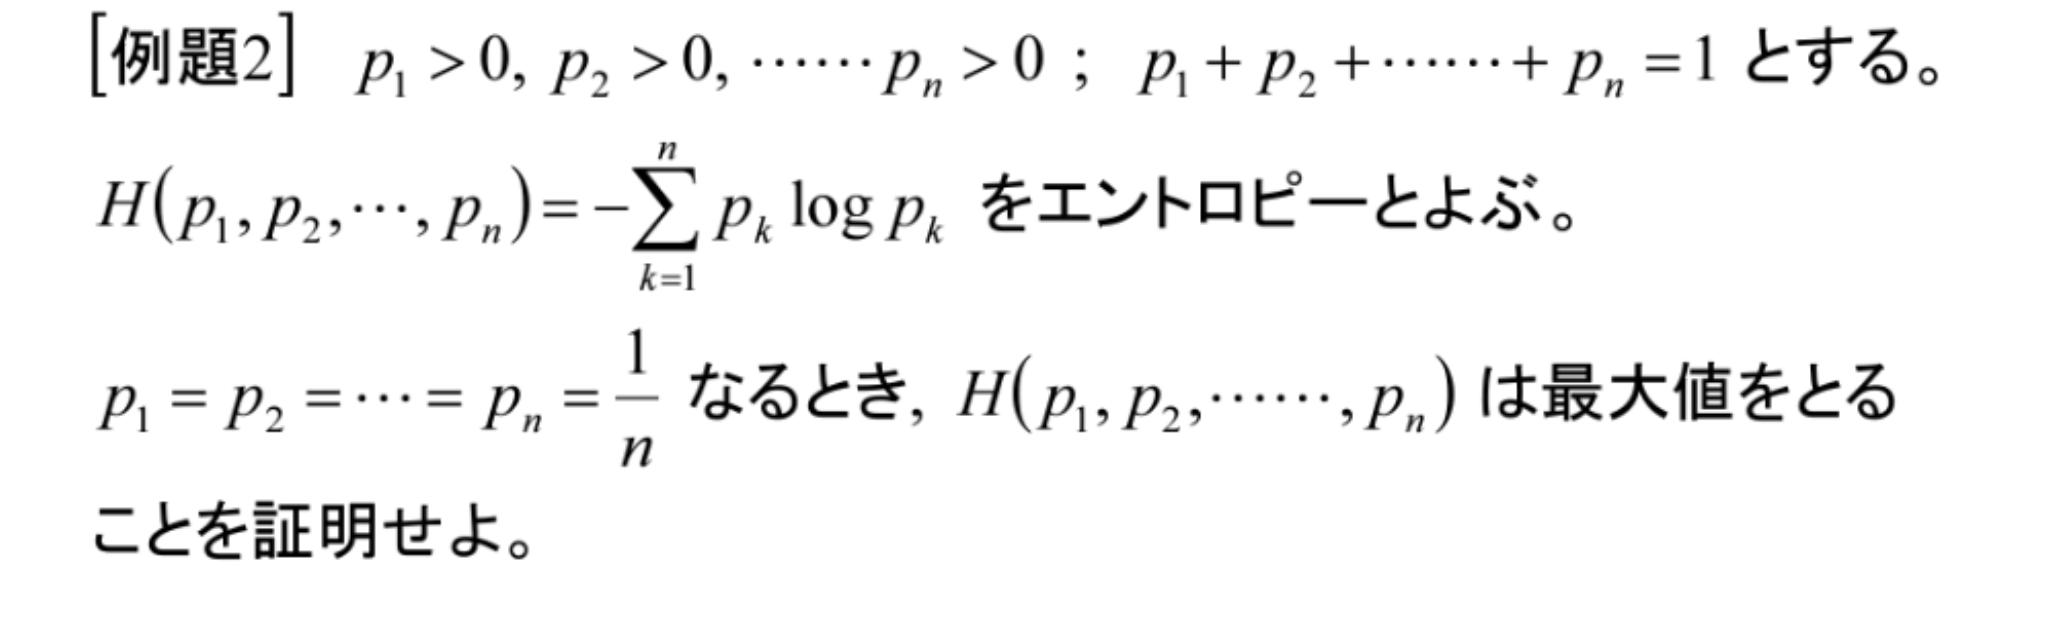 解析学演習《57》微分法(Jensenの不等式)_b0368745_01542673.png